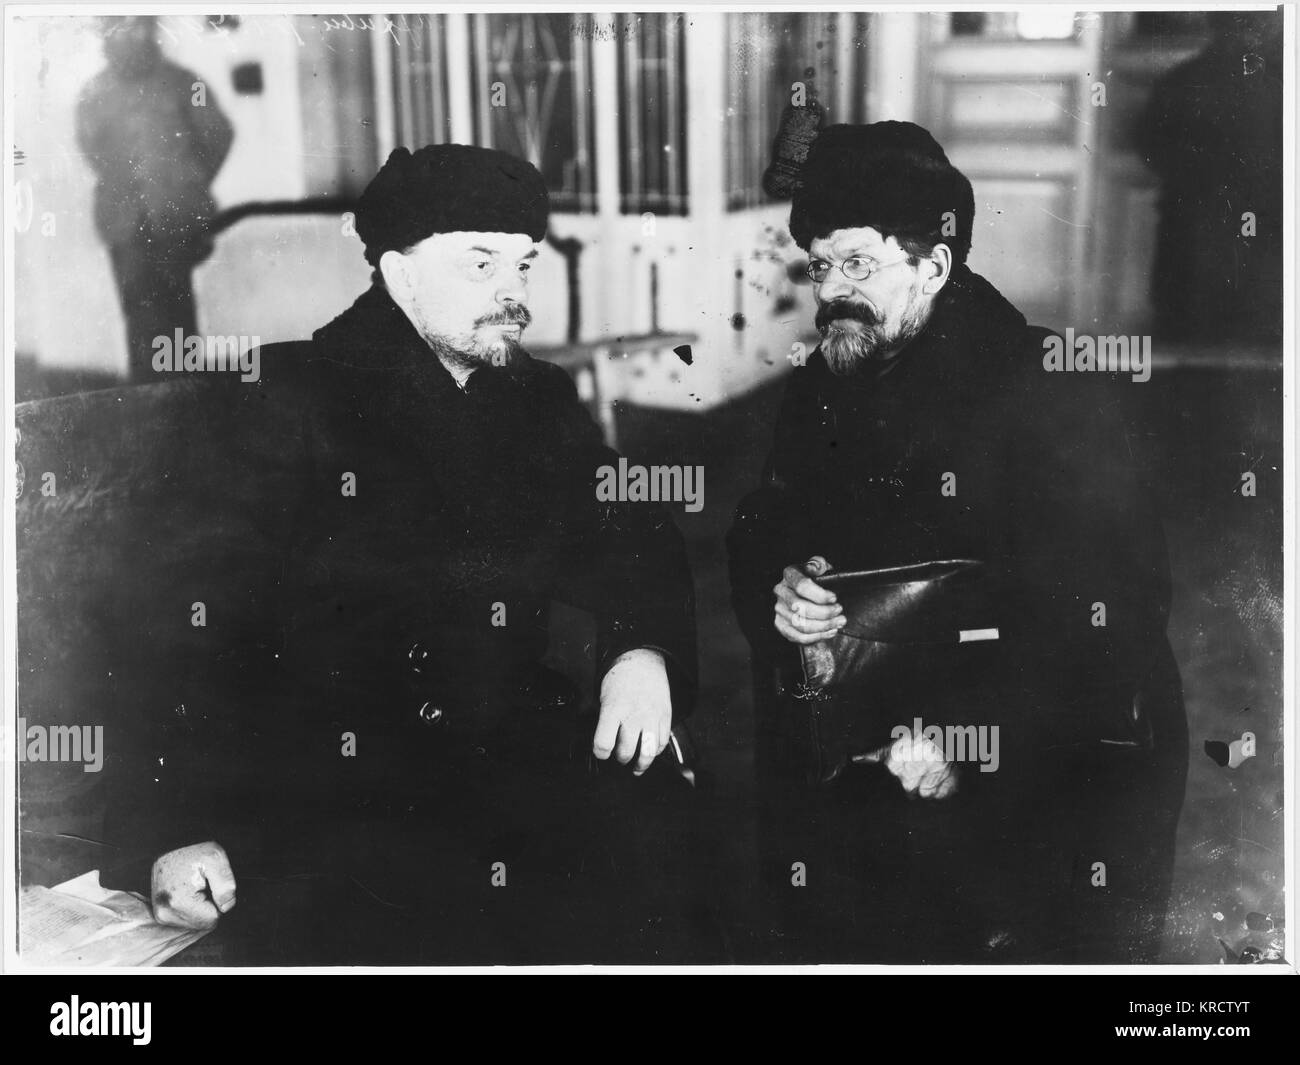 VLADIMIR ILYICH LENIN Sitting with M Kalinin Date: 1920 - Stock Image